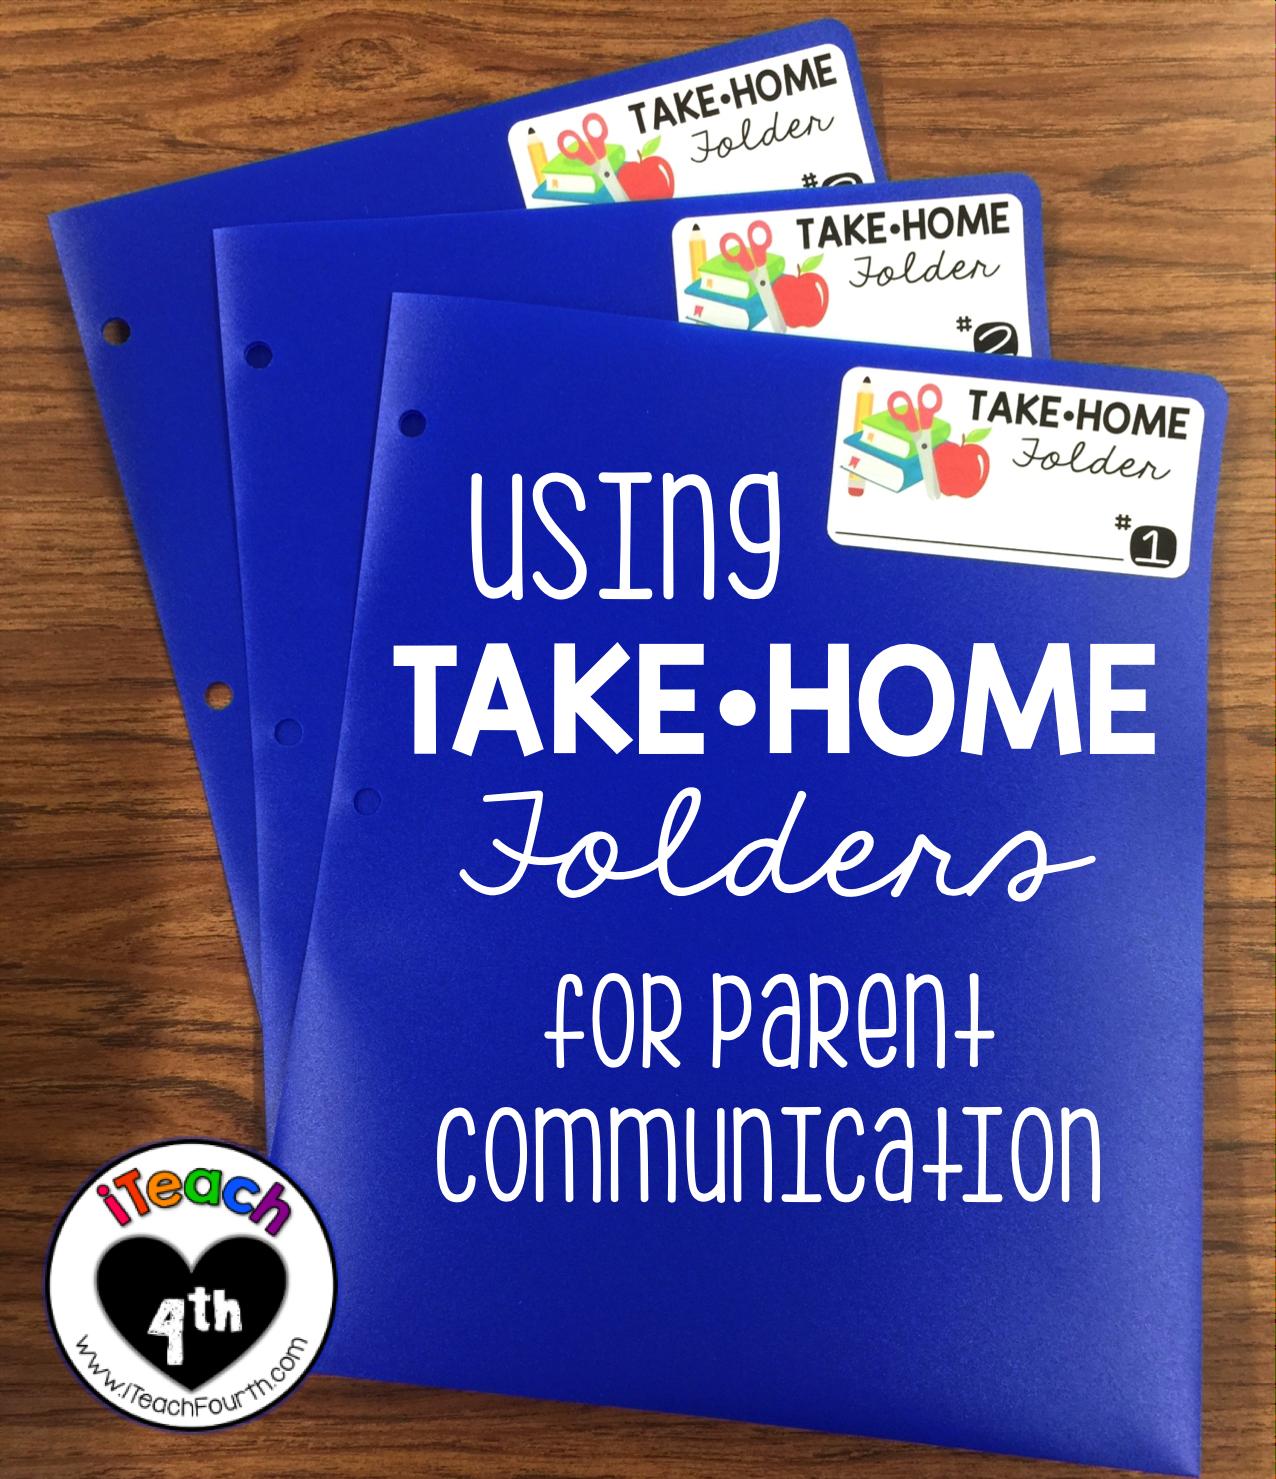 Iteach Fourth 4th Grade Teaching Resources Using Take